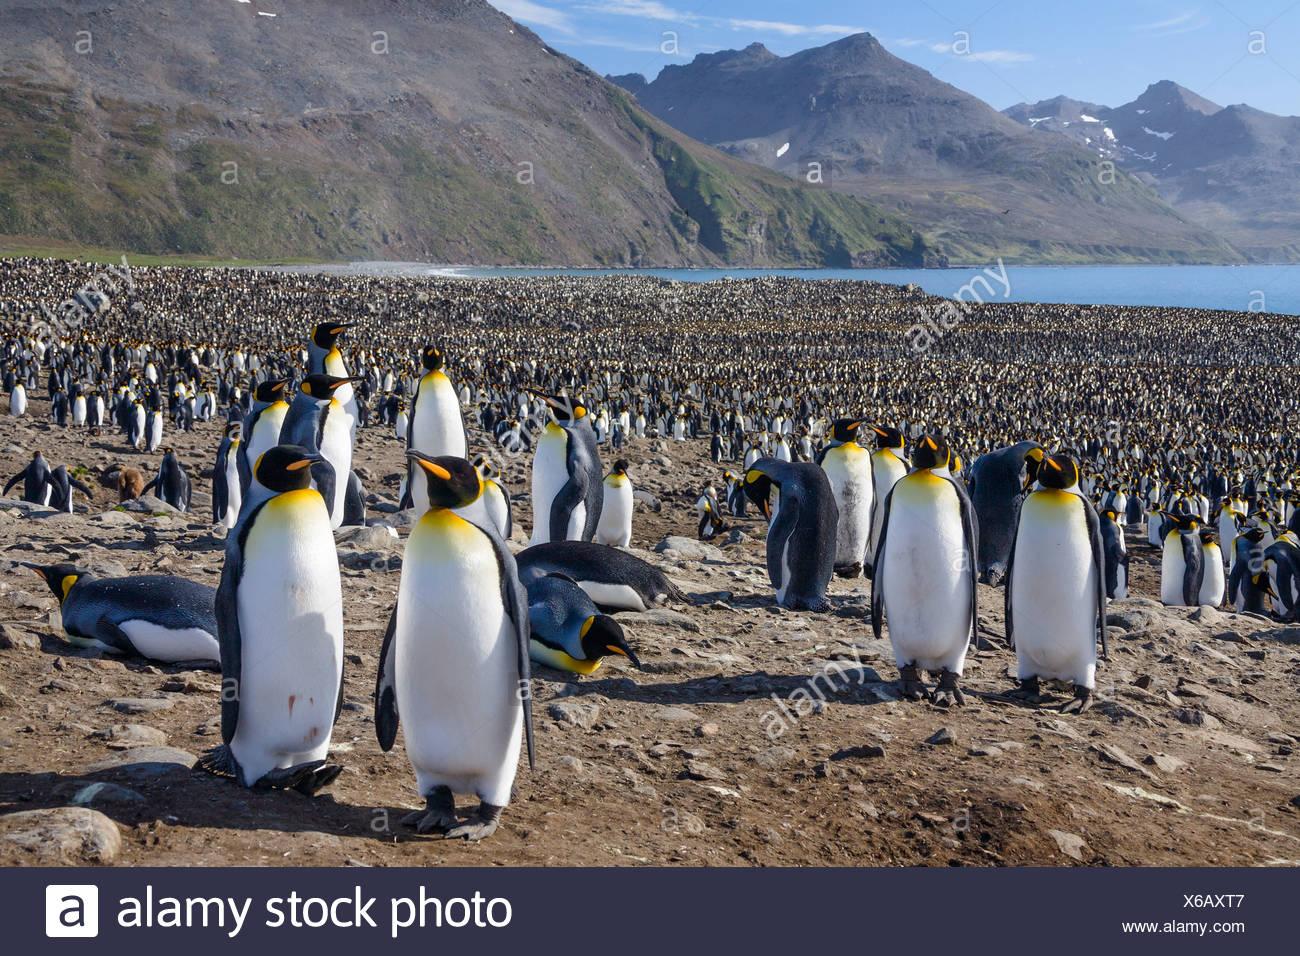 King Penguins in colony, Aptenodytes patagonicus, colony, St Andrews Bay, South Georgia, Subantarctic, Antarctica - Stock Image